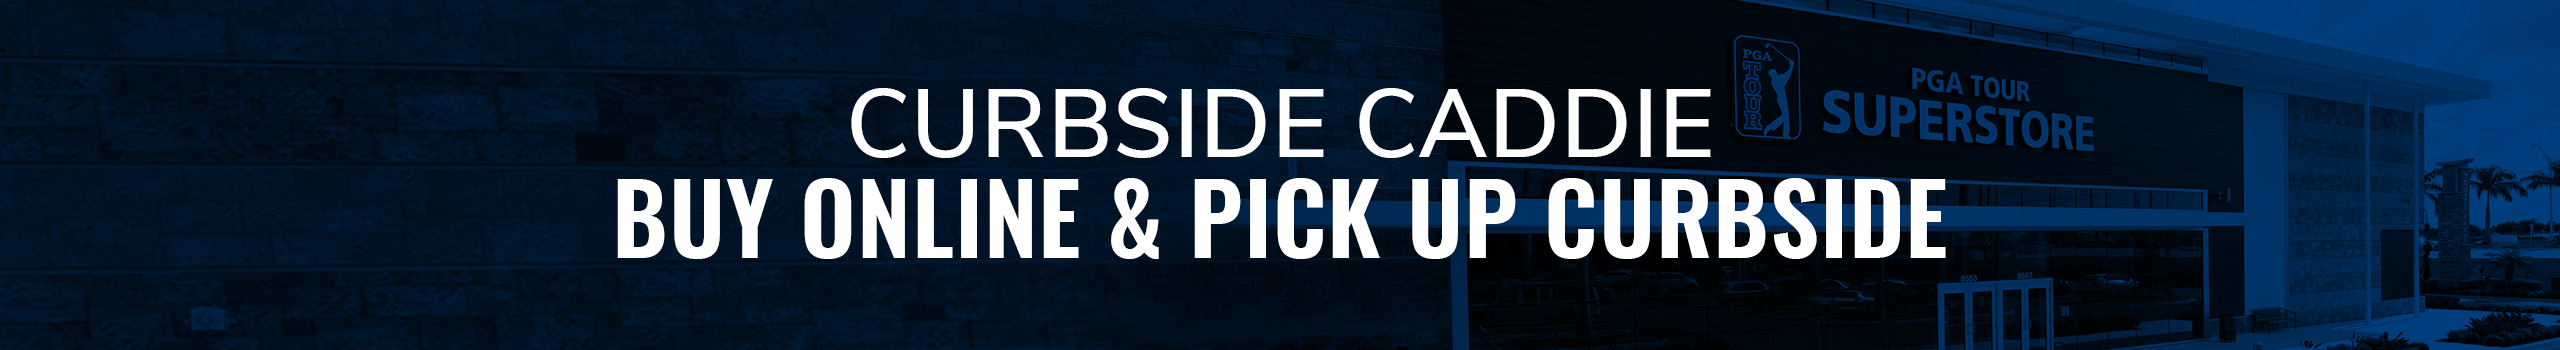 Curbside Caddie Banner